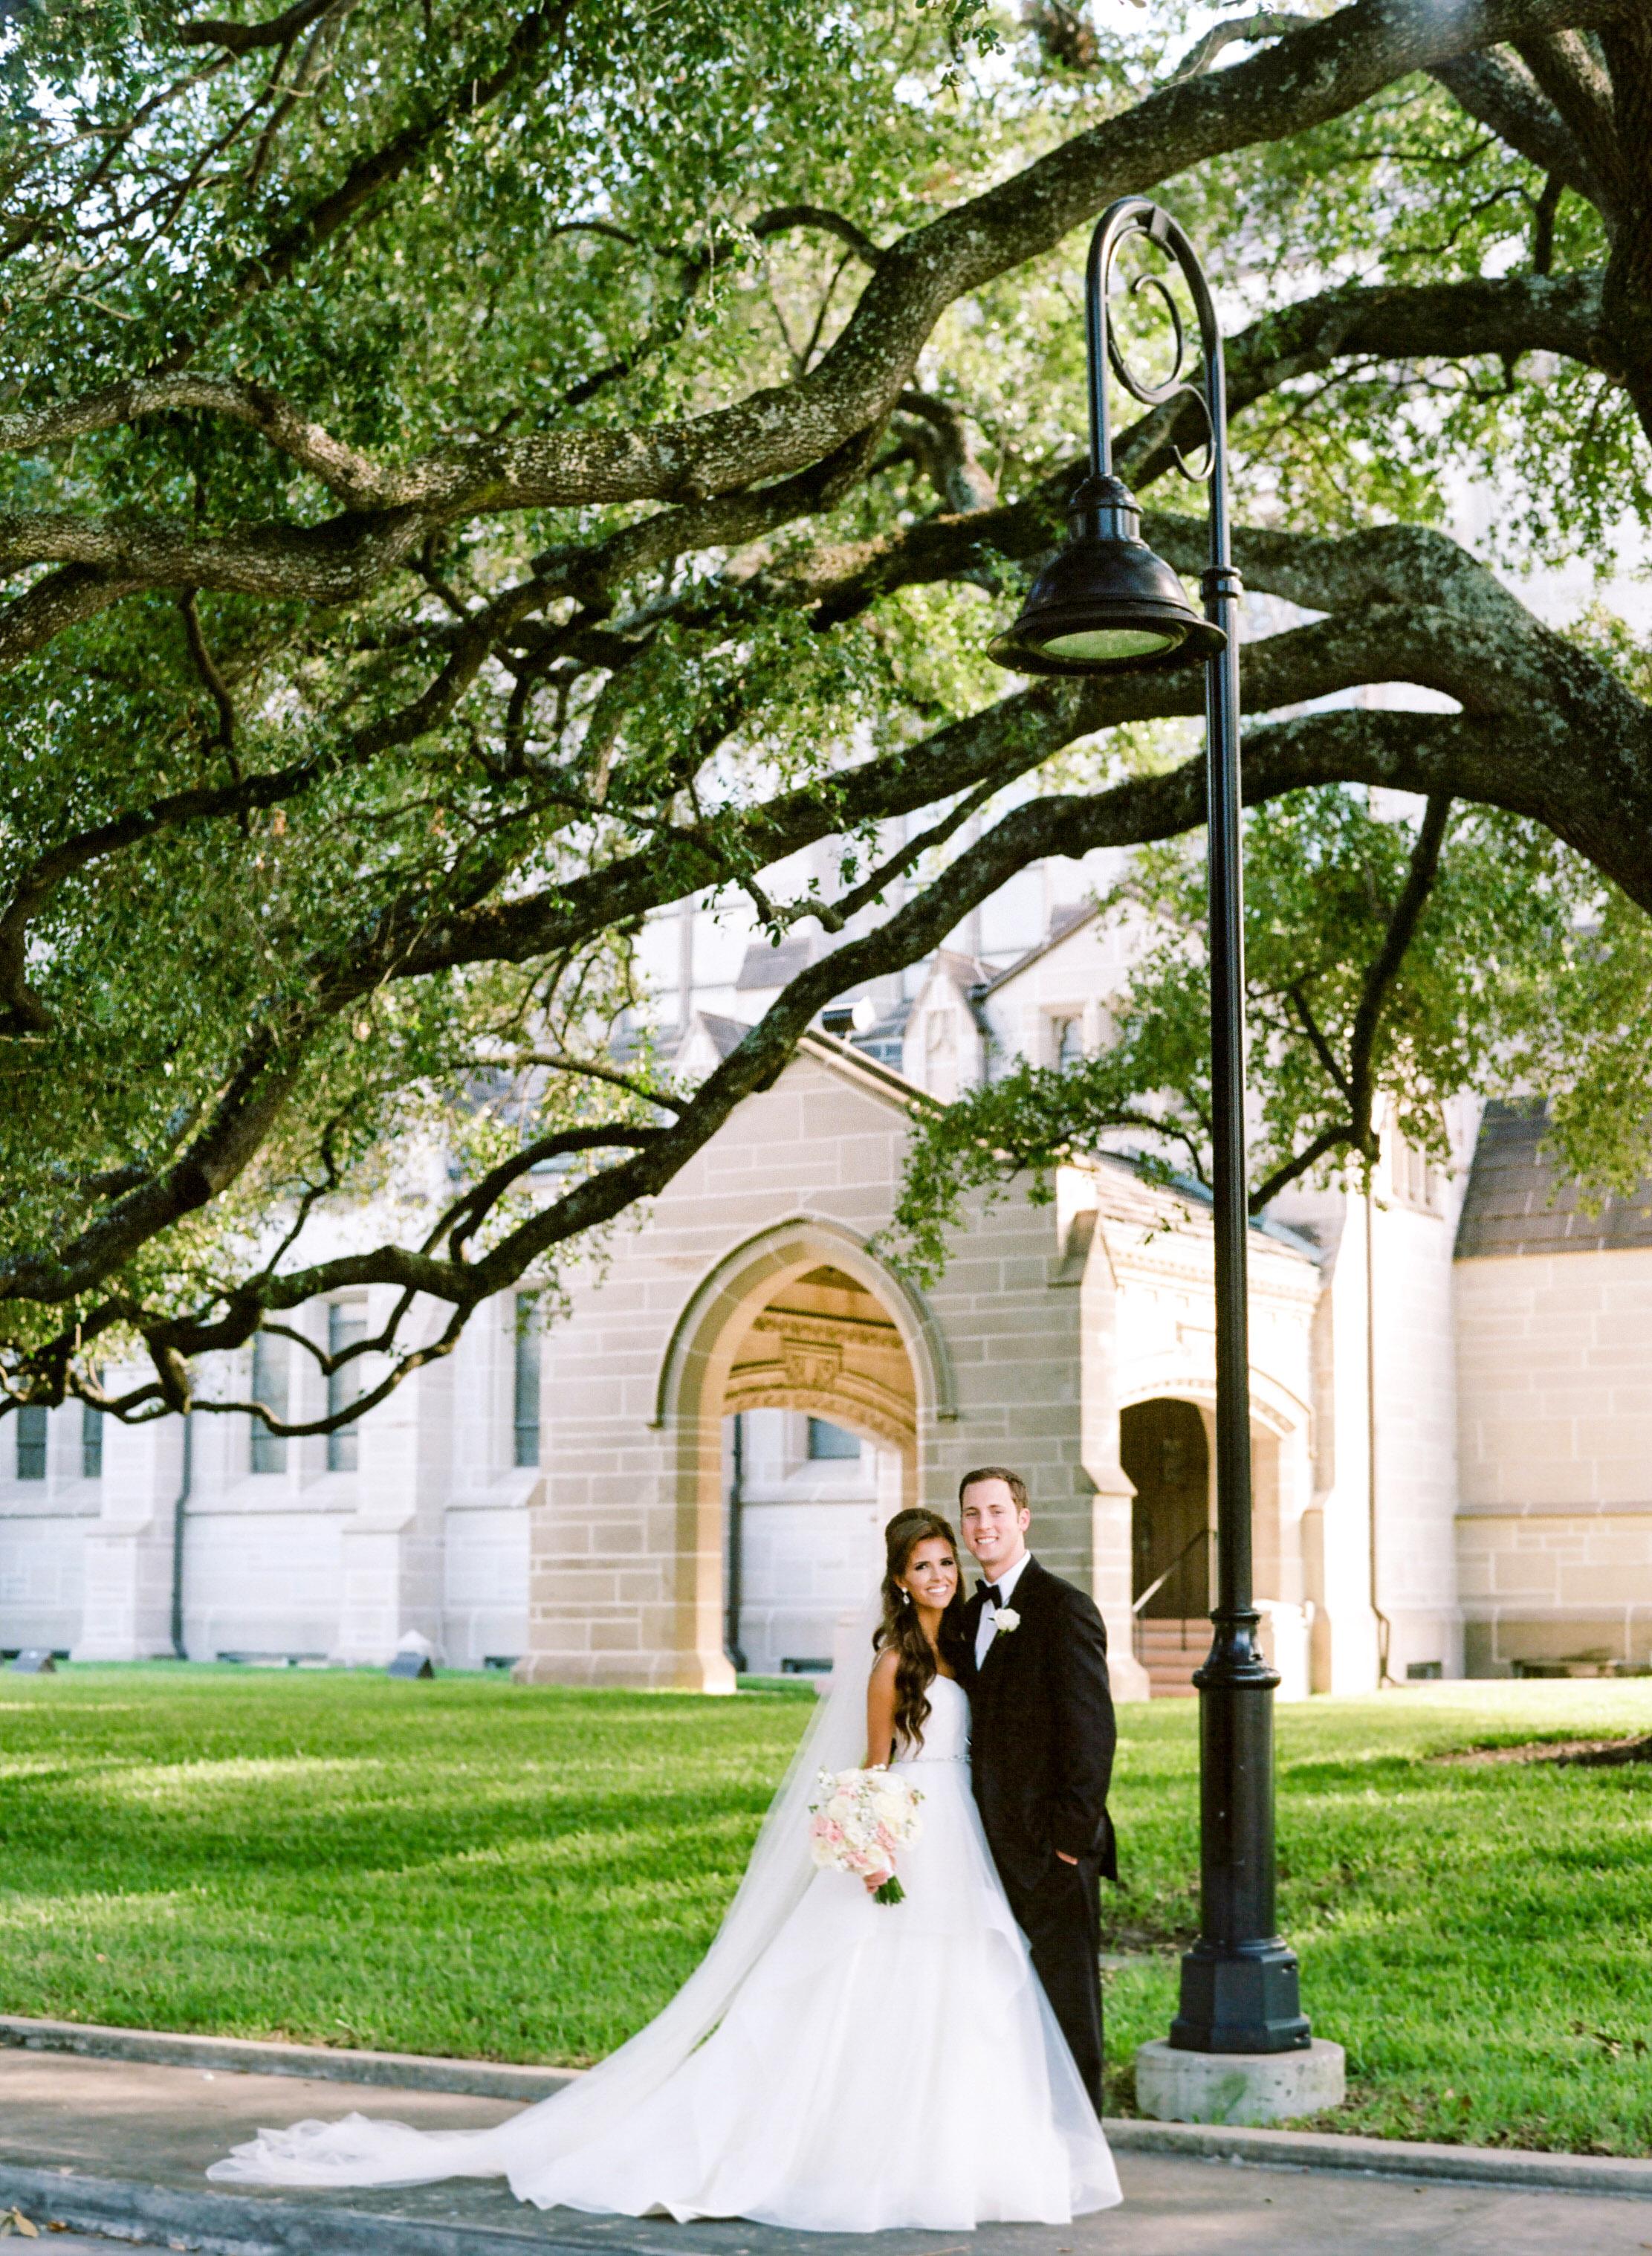 Dana-Fernandez-Photography-Weddings-in-Houston-Magazine-feature-Houston-wedding-photographer-film-27.jpg